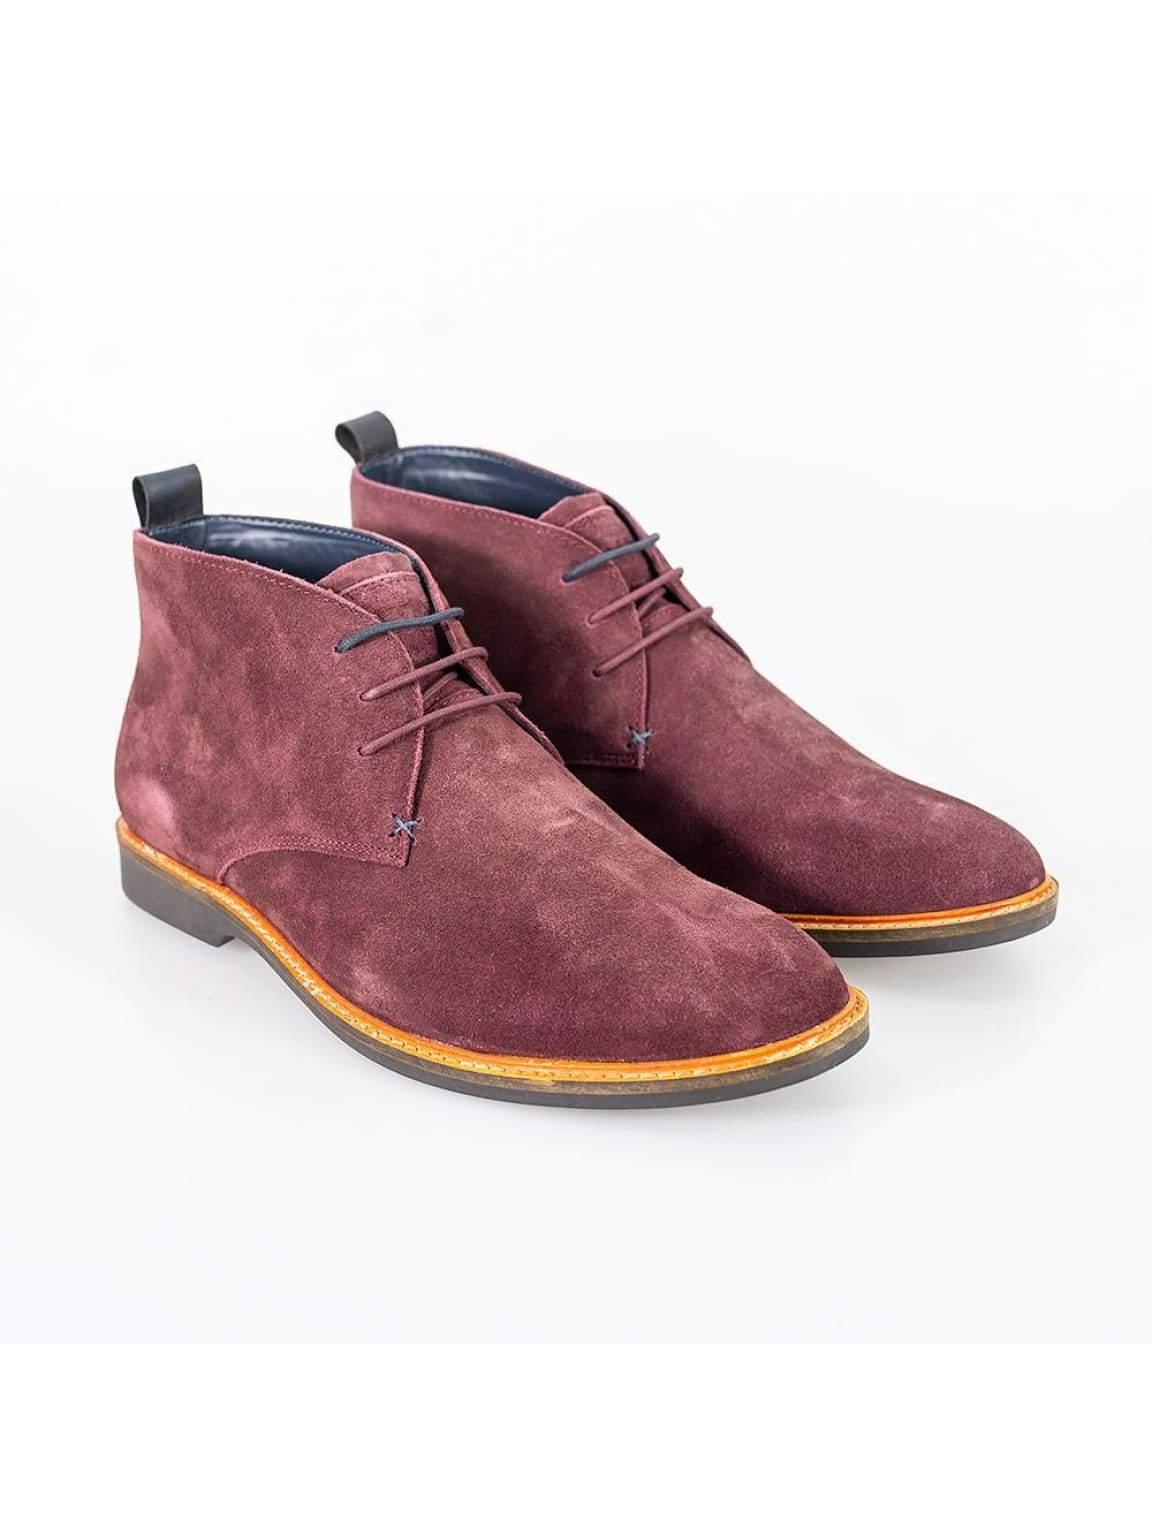 Cavani Sahara Burgundy Mens Leather Boots - UK7 | EU41 - Boots